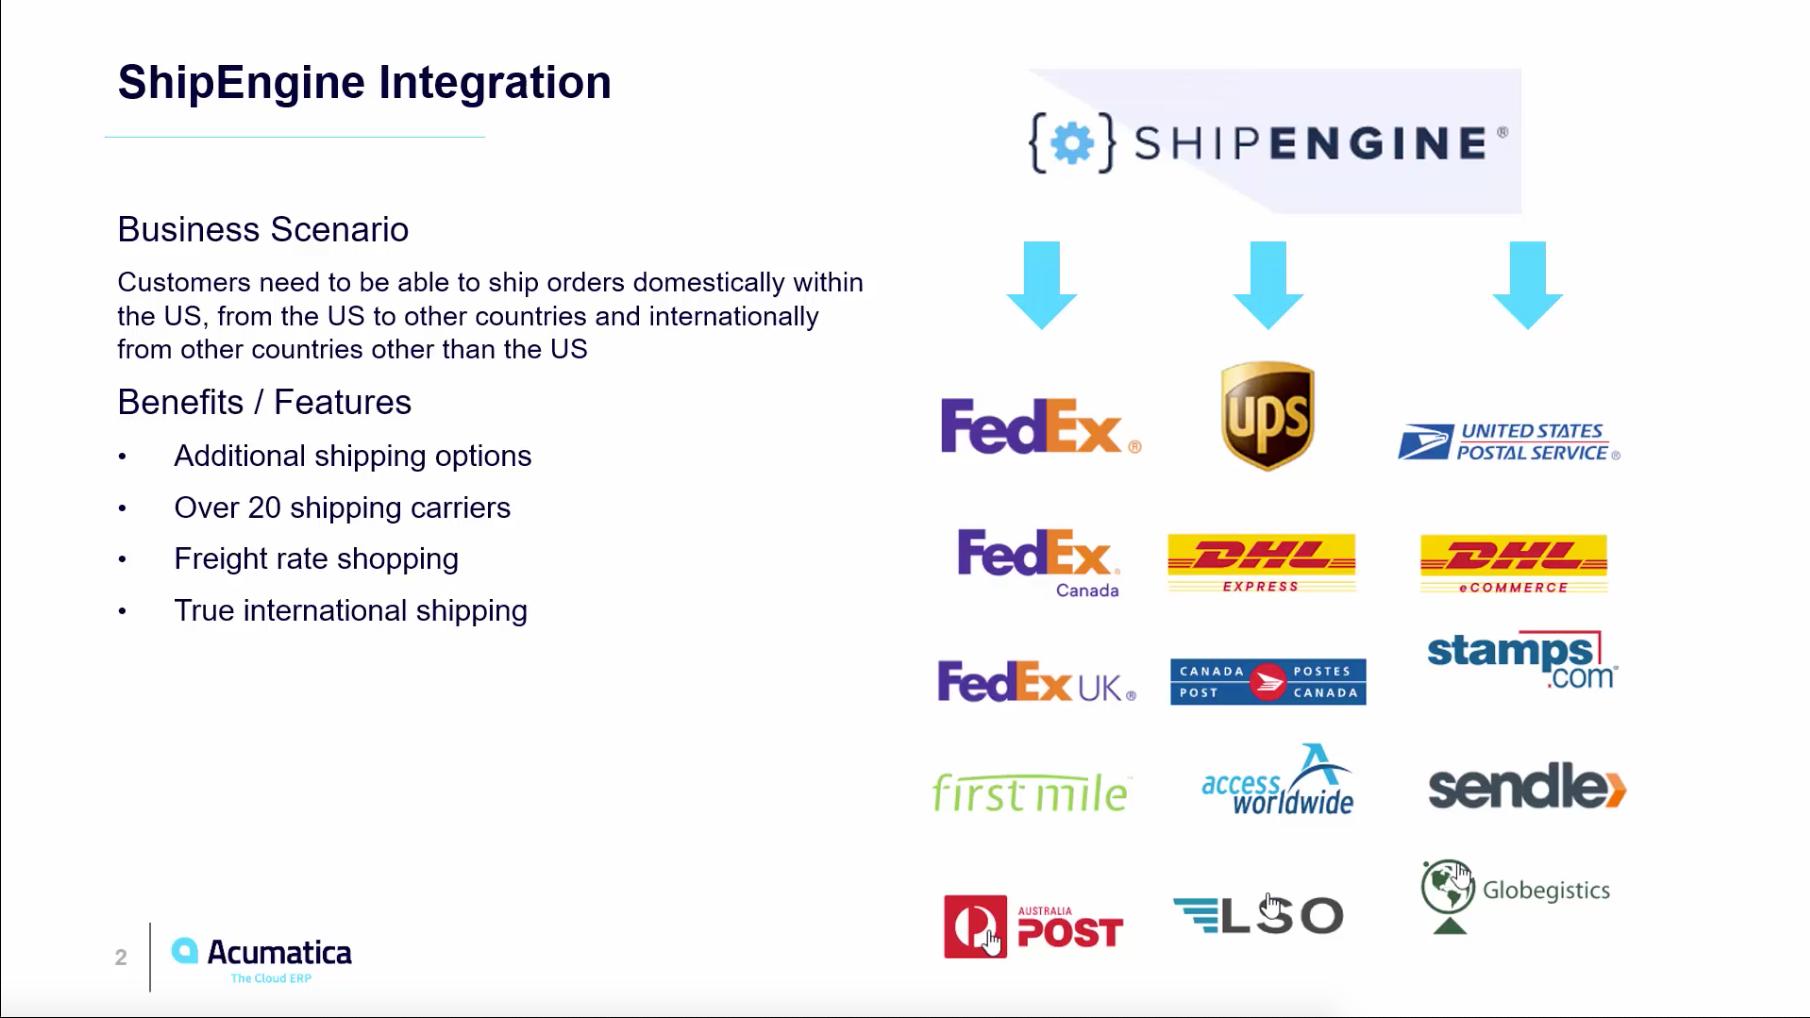 ShipEngine Benefits